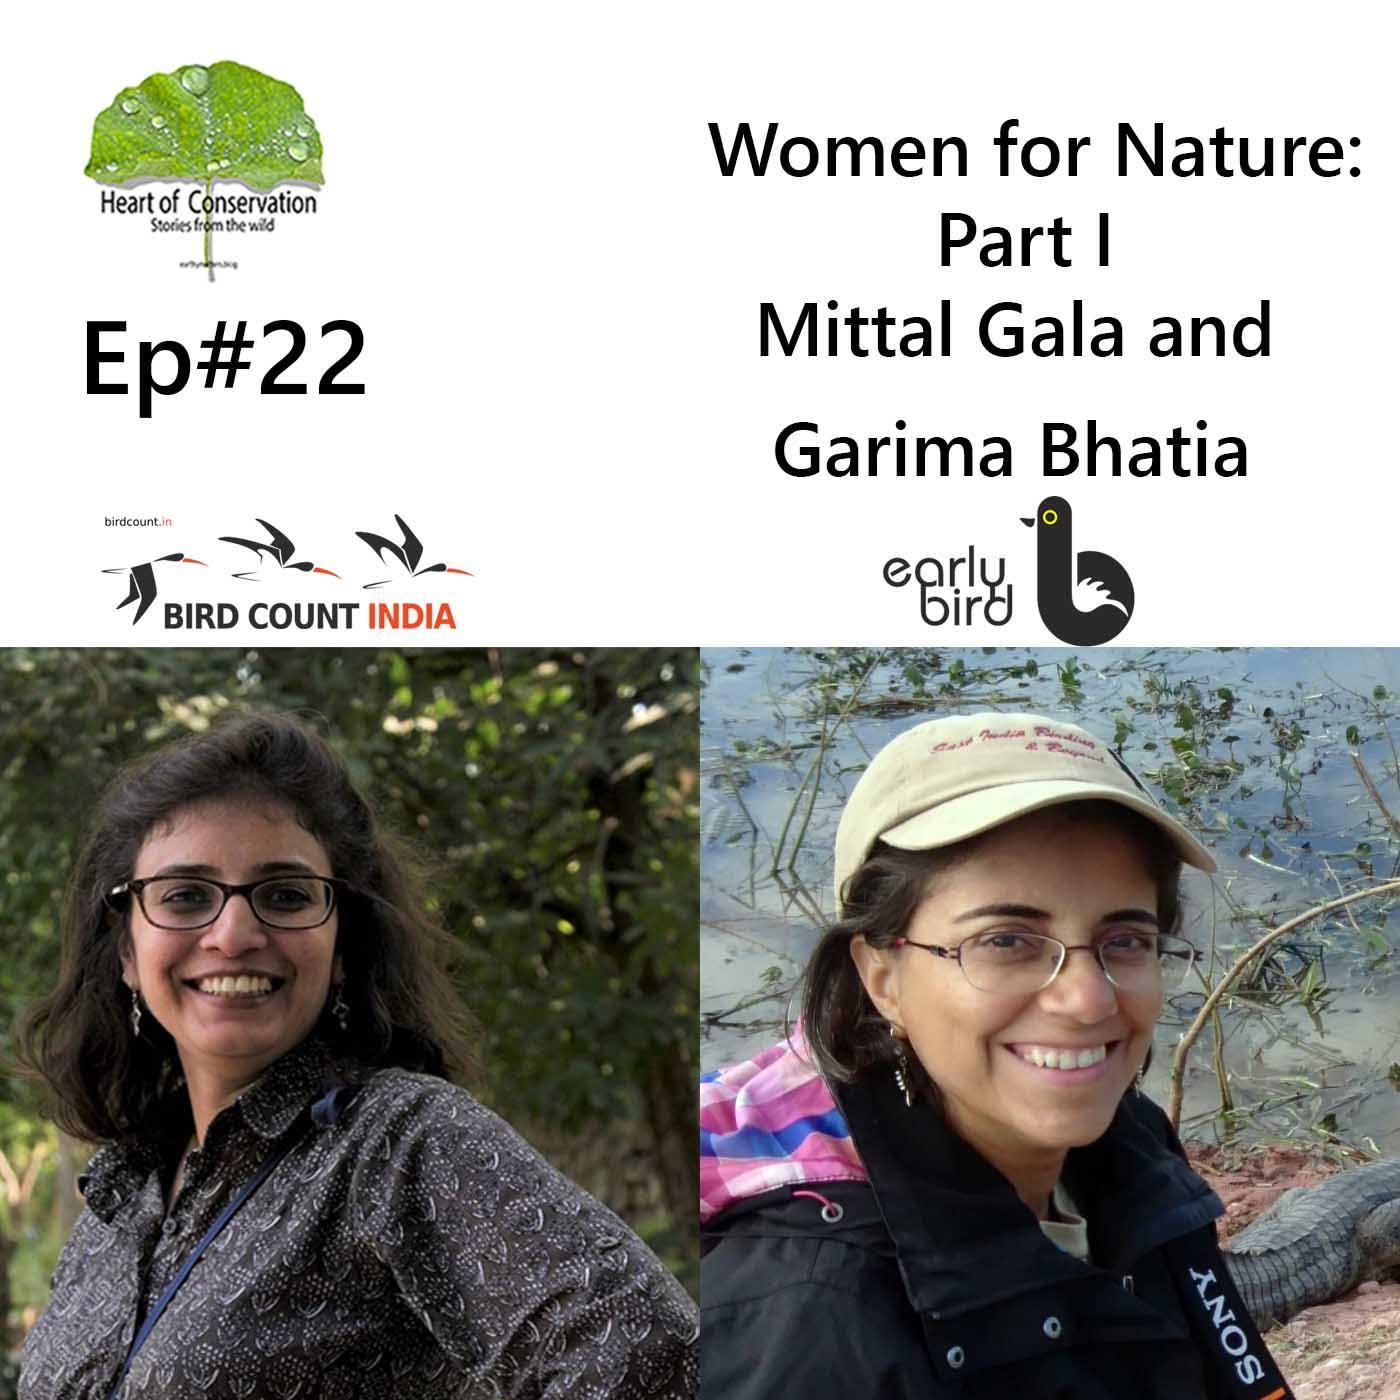 Women for Nature: Mittal Gala and Garima Bhatia.